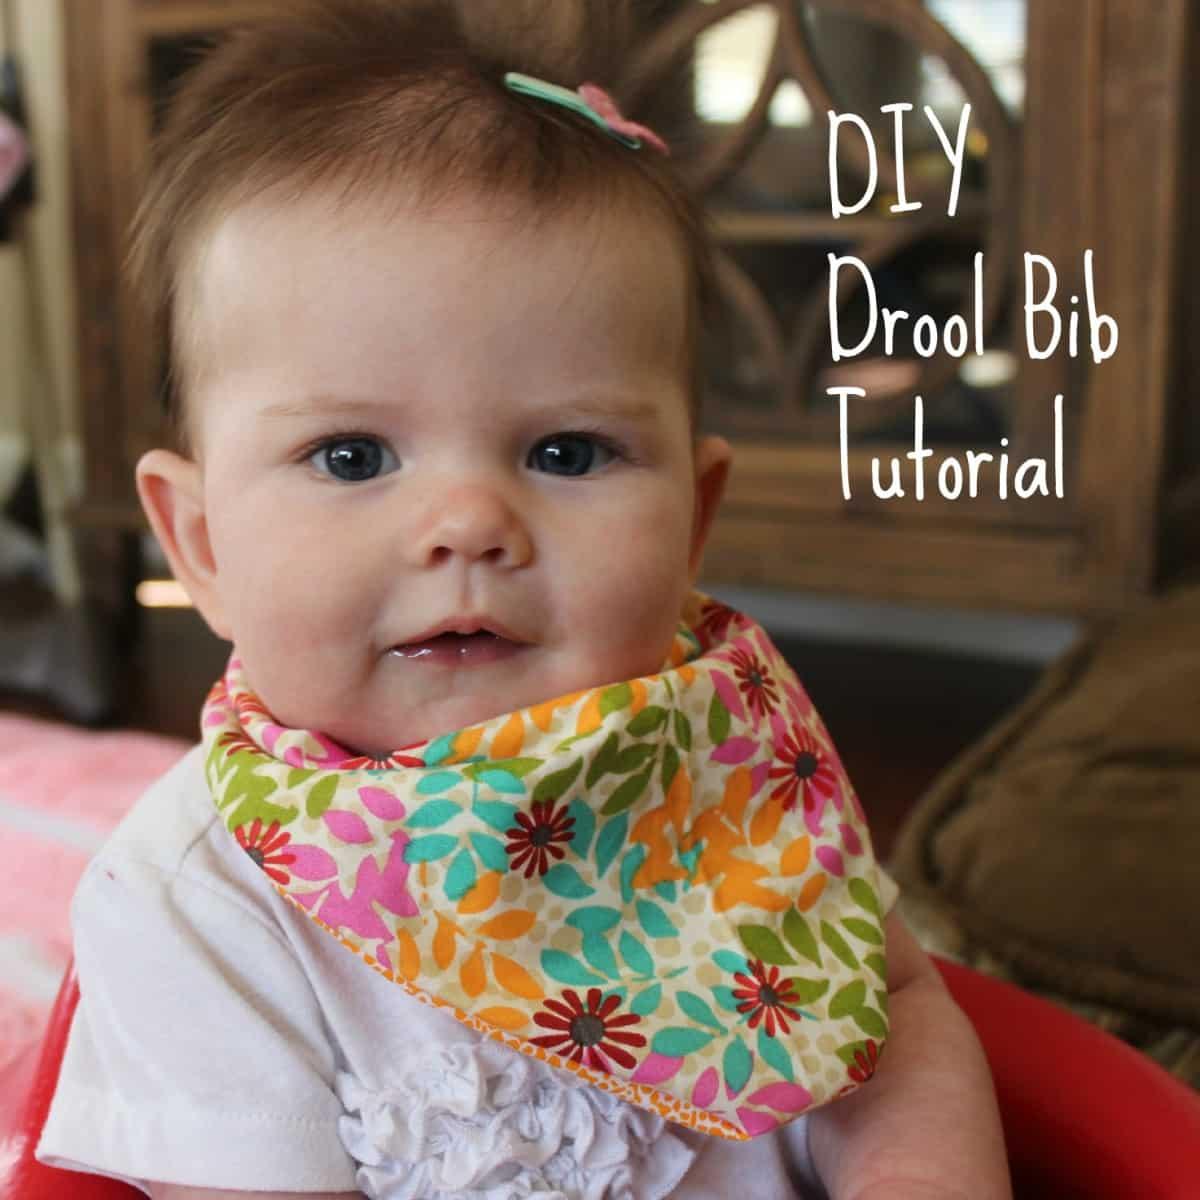 Baby Drool Bib